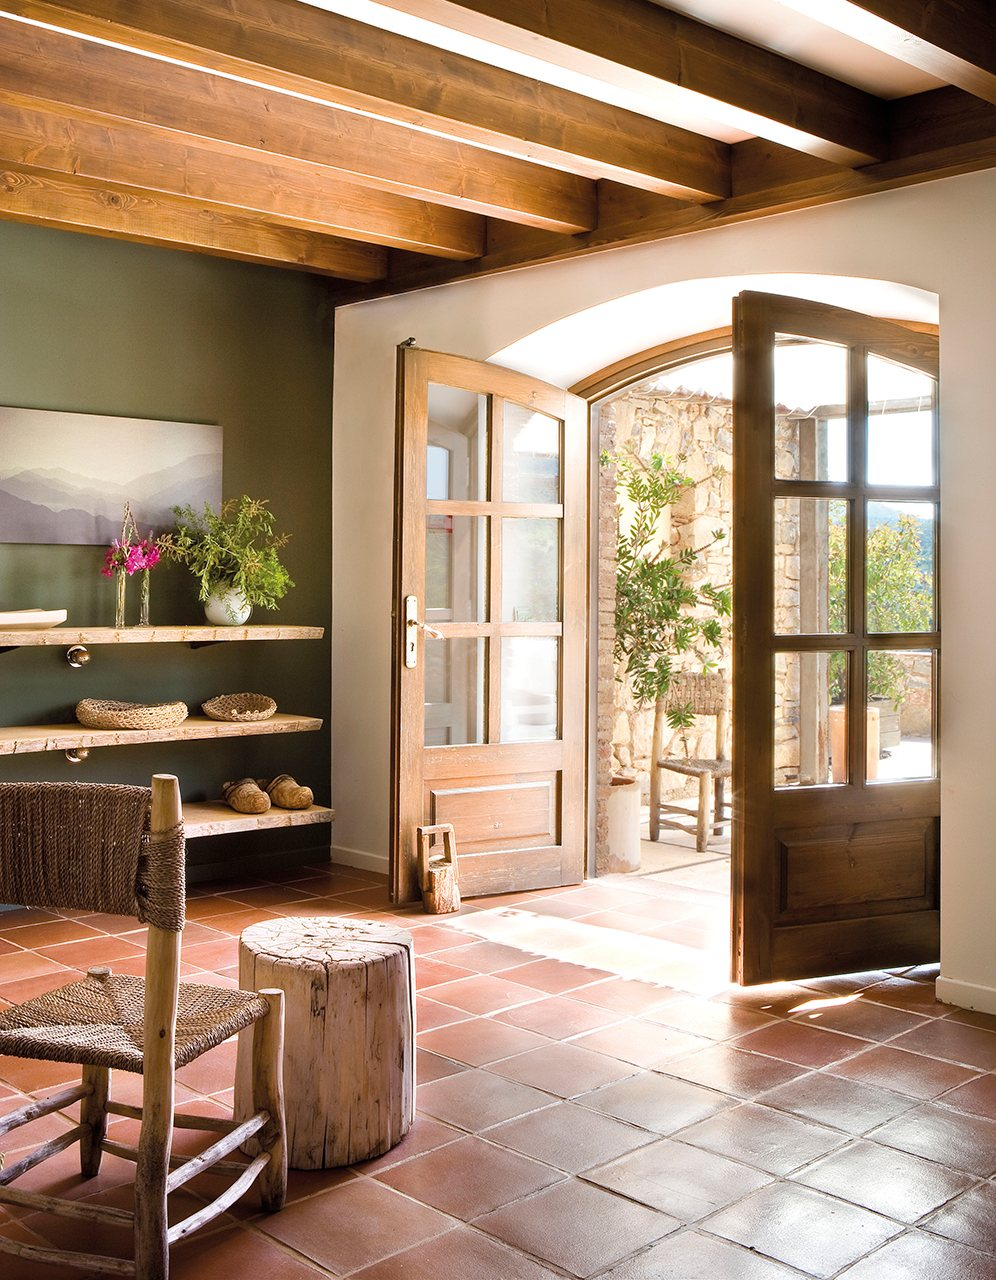 Reinventa tu recibidor con peque os cambios for Puertas para patio interior